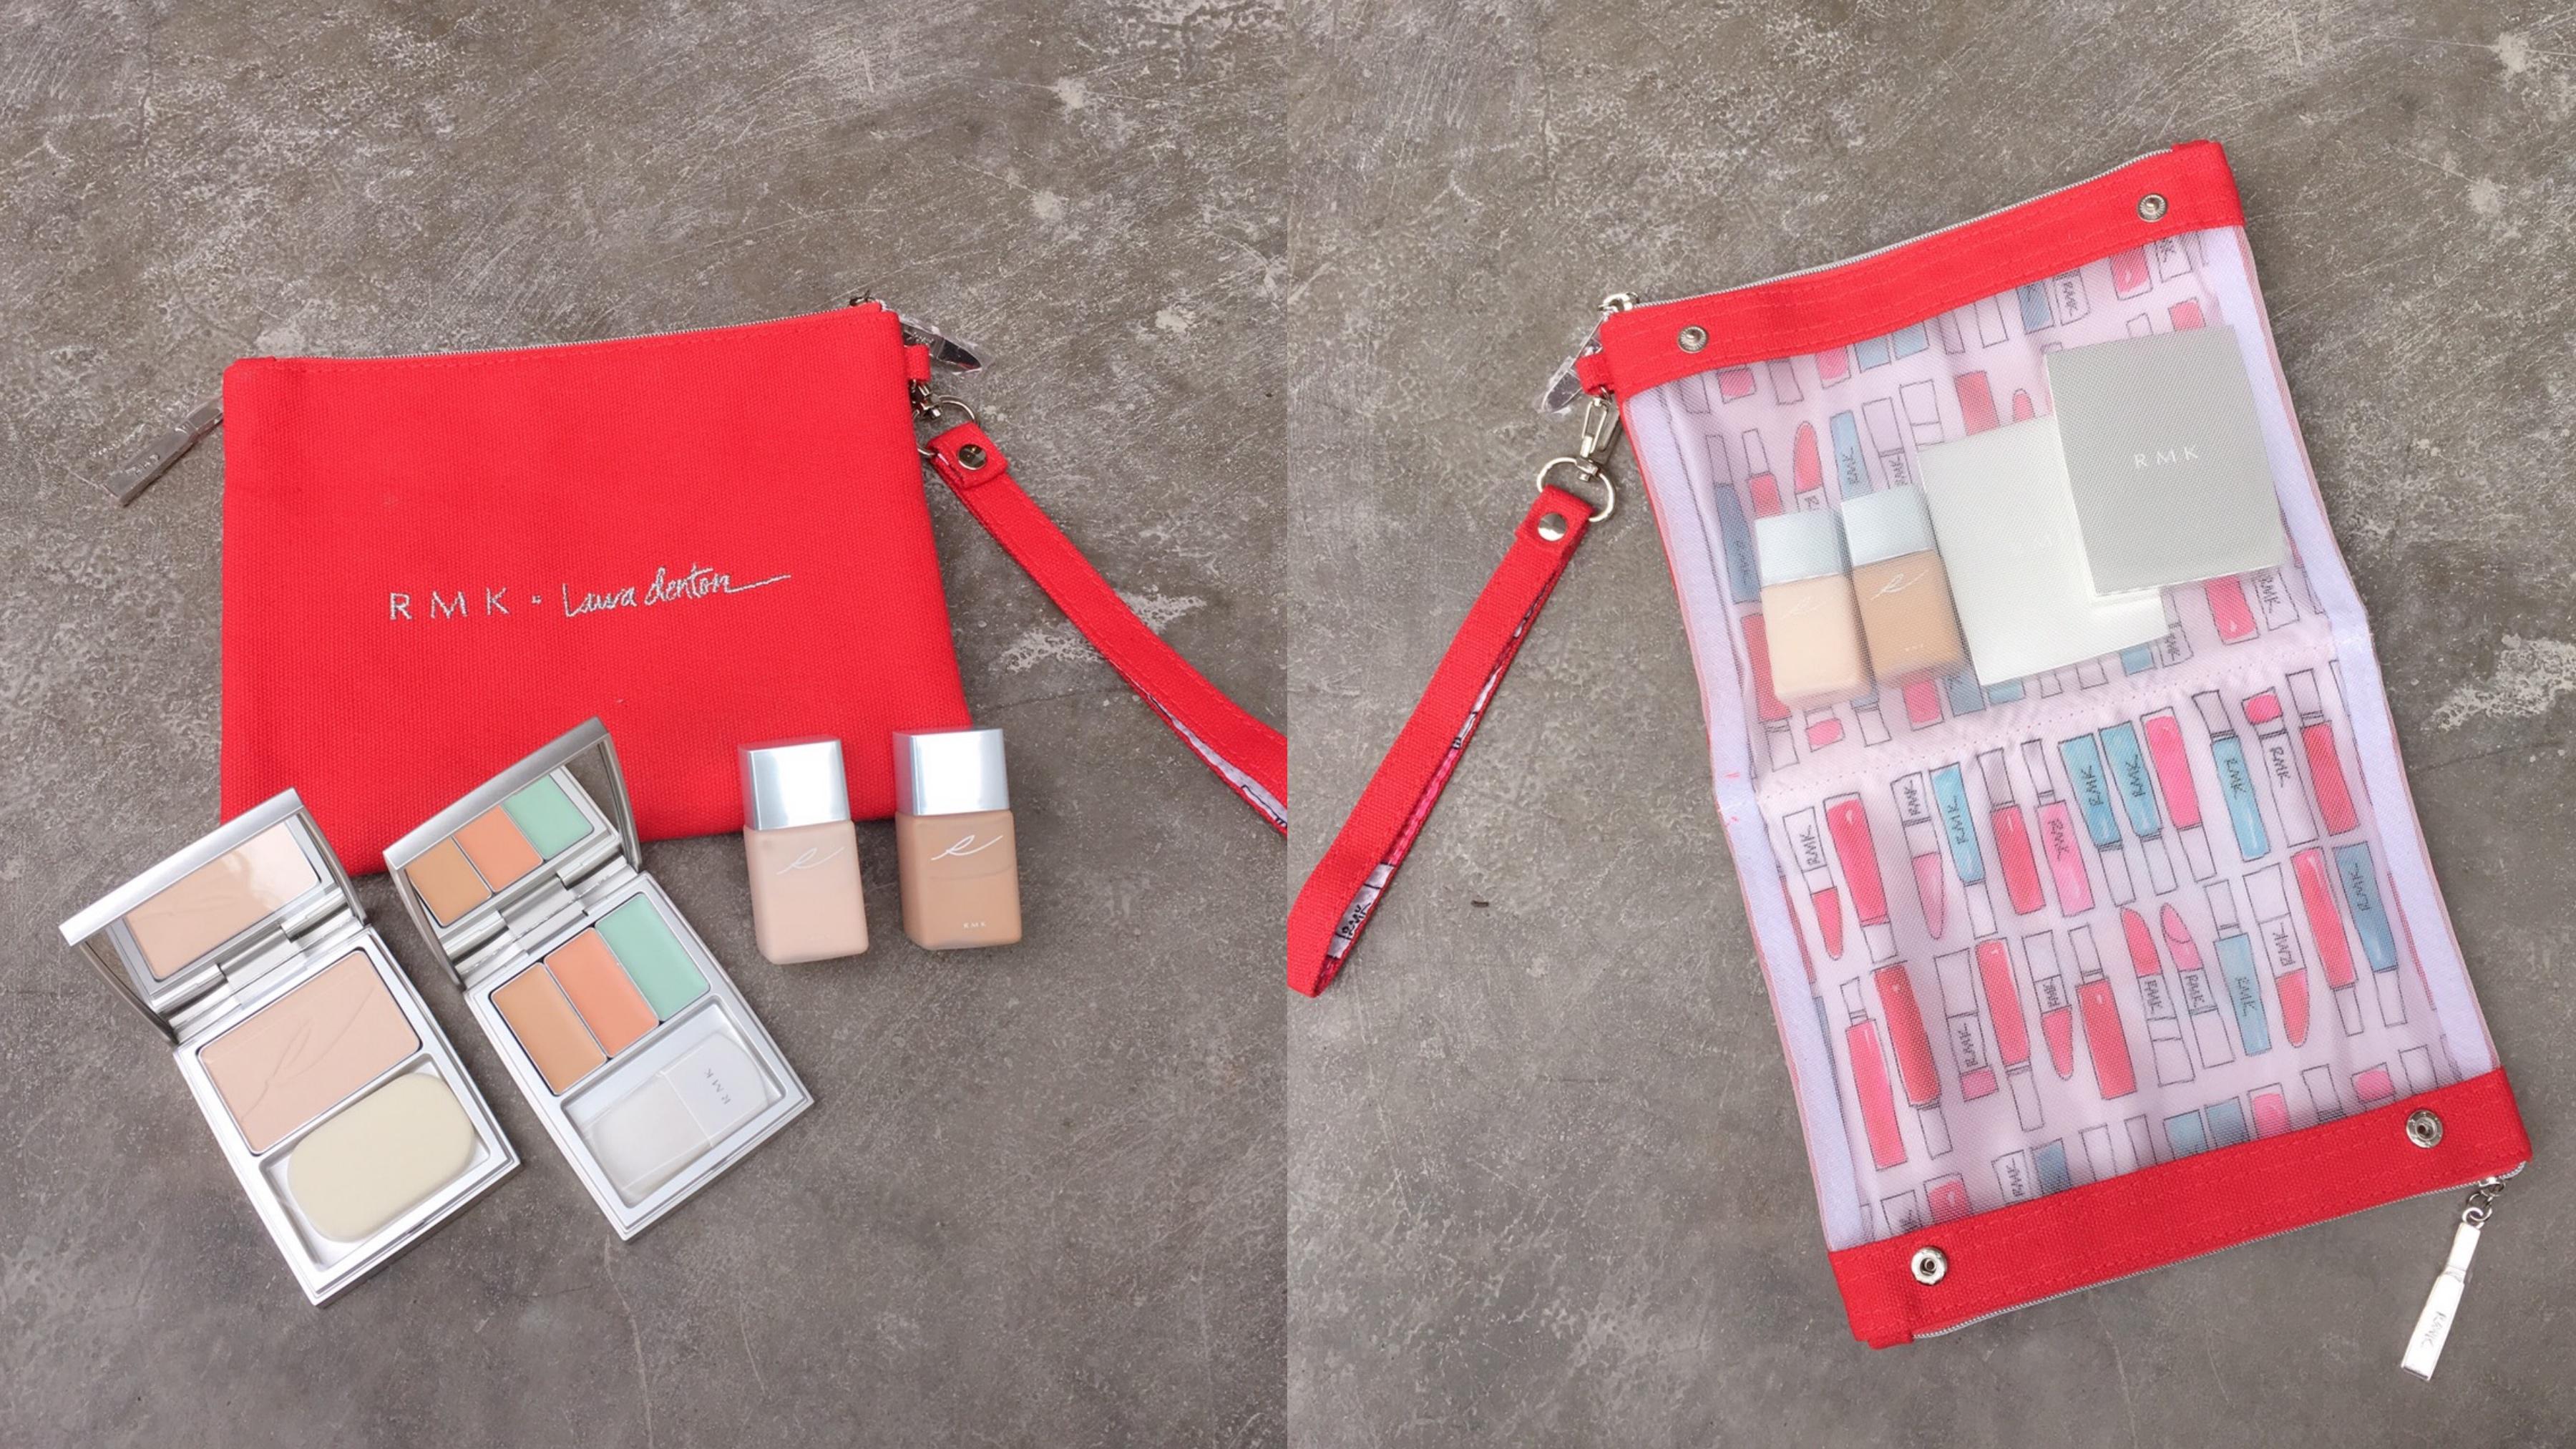 RMK 度假底妝旅行組 RMK Christmas Travel Base Makeup Kit 2018 A